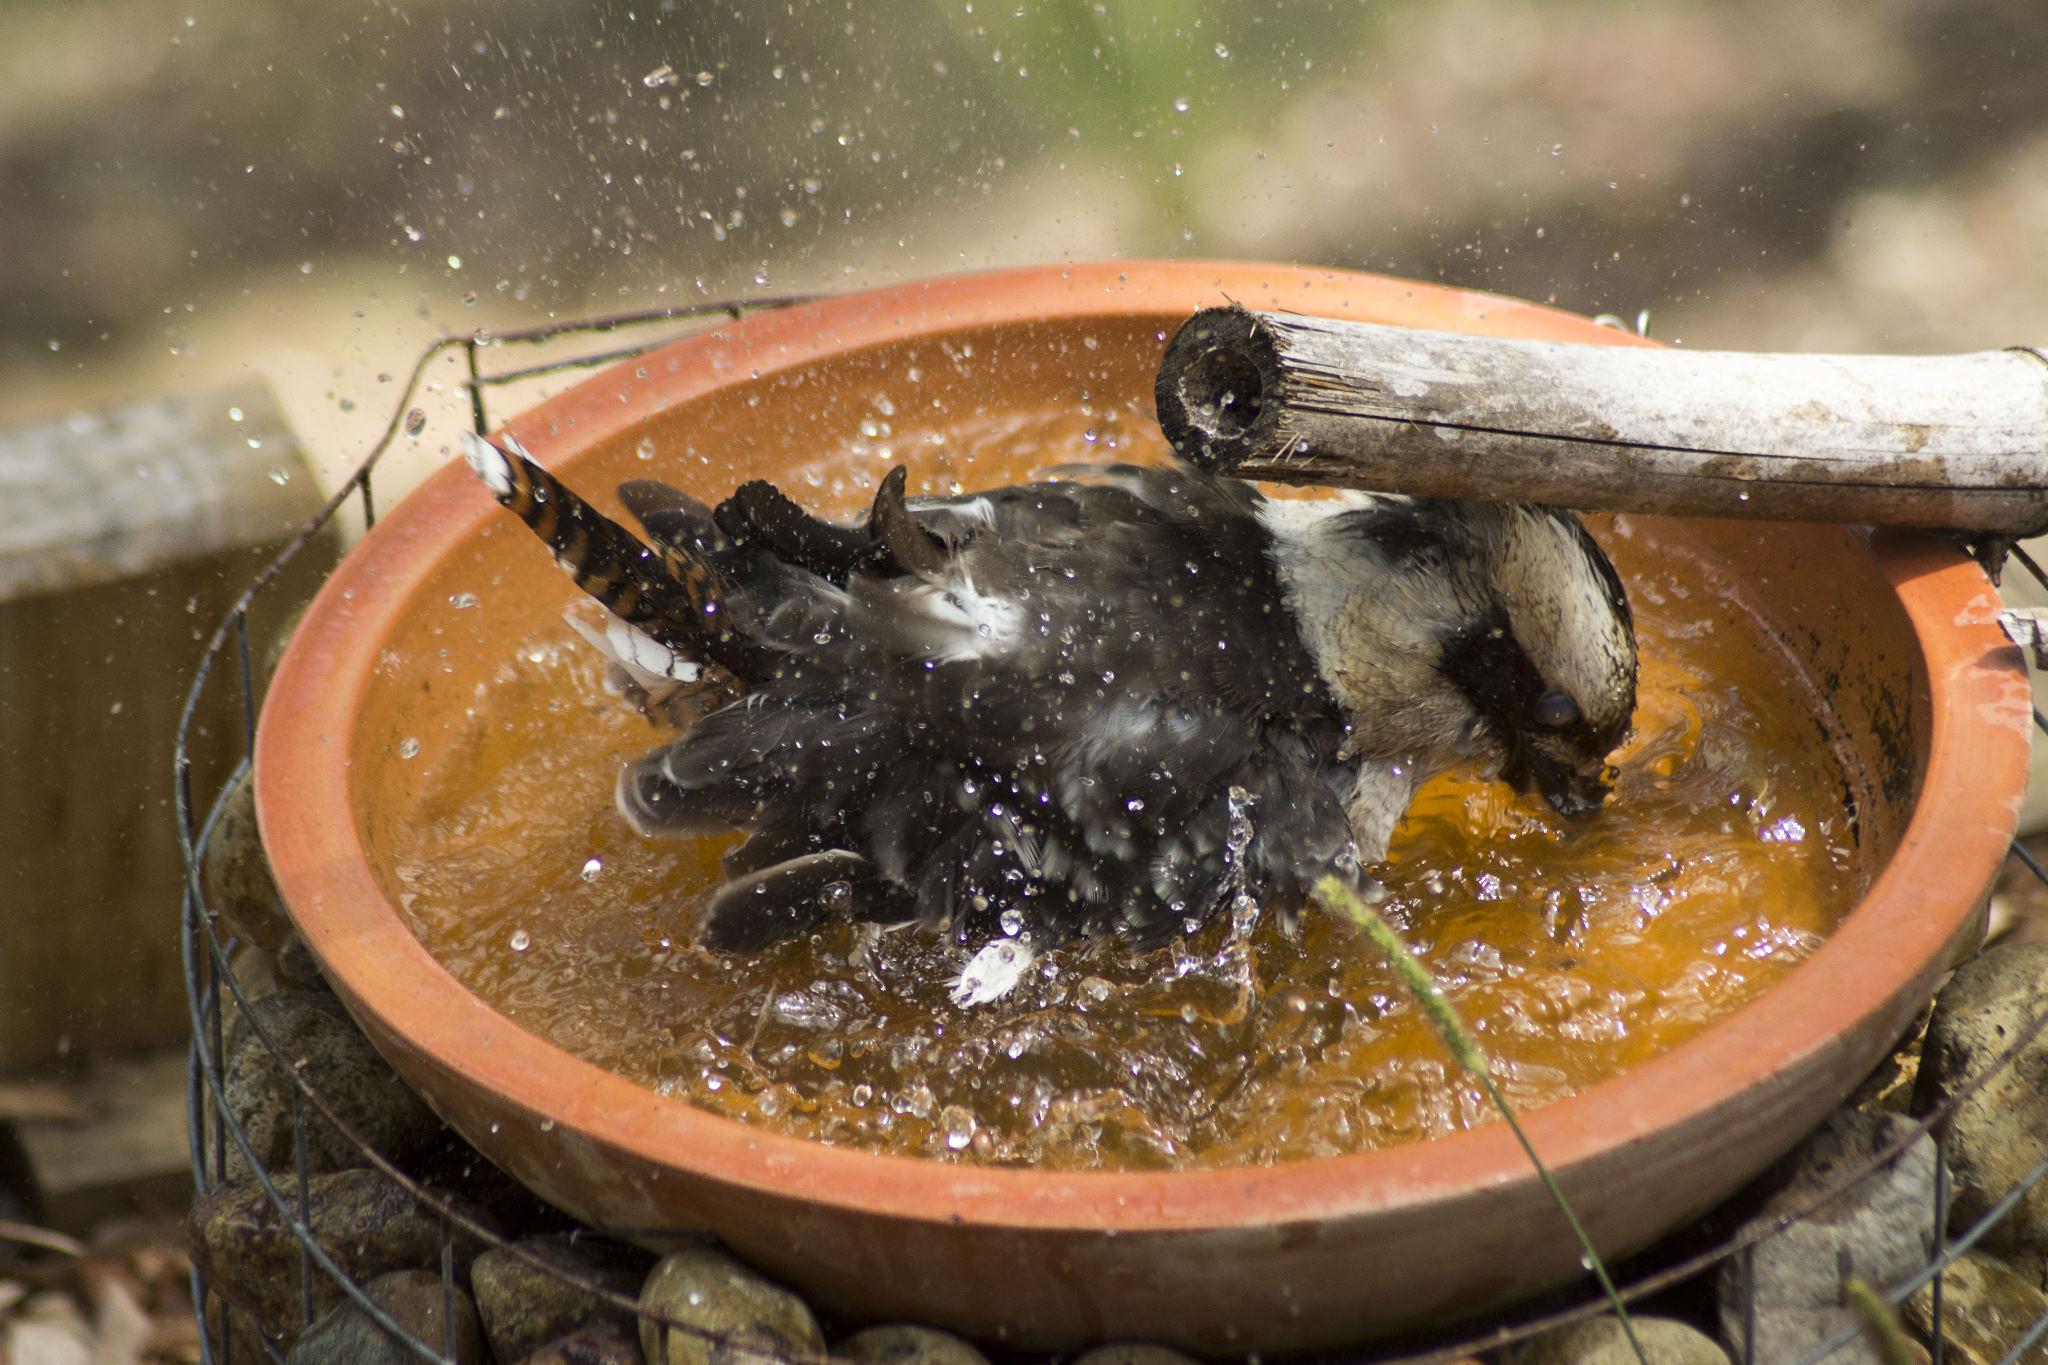 Kookaburra takes a bath